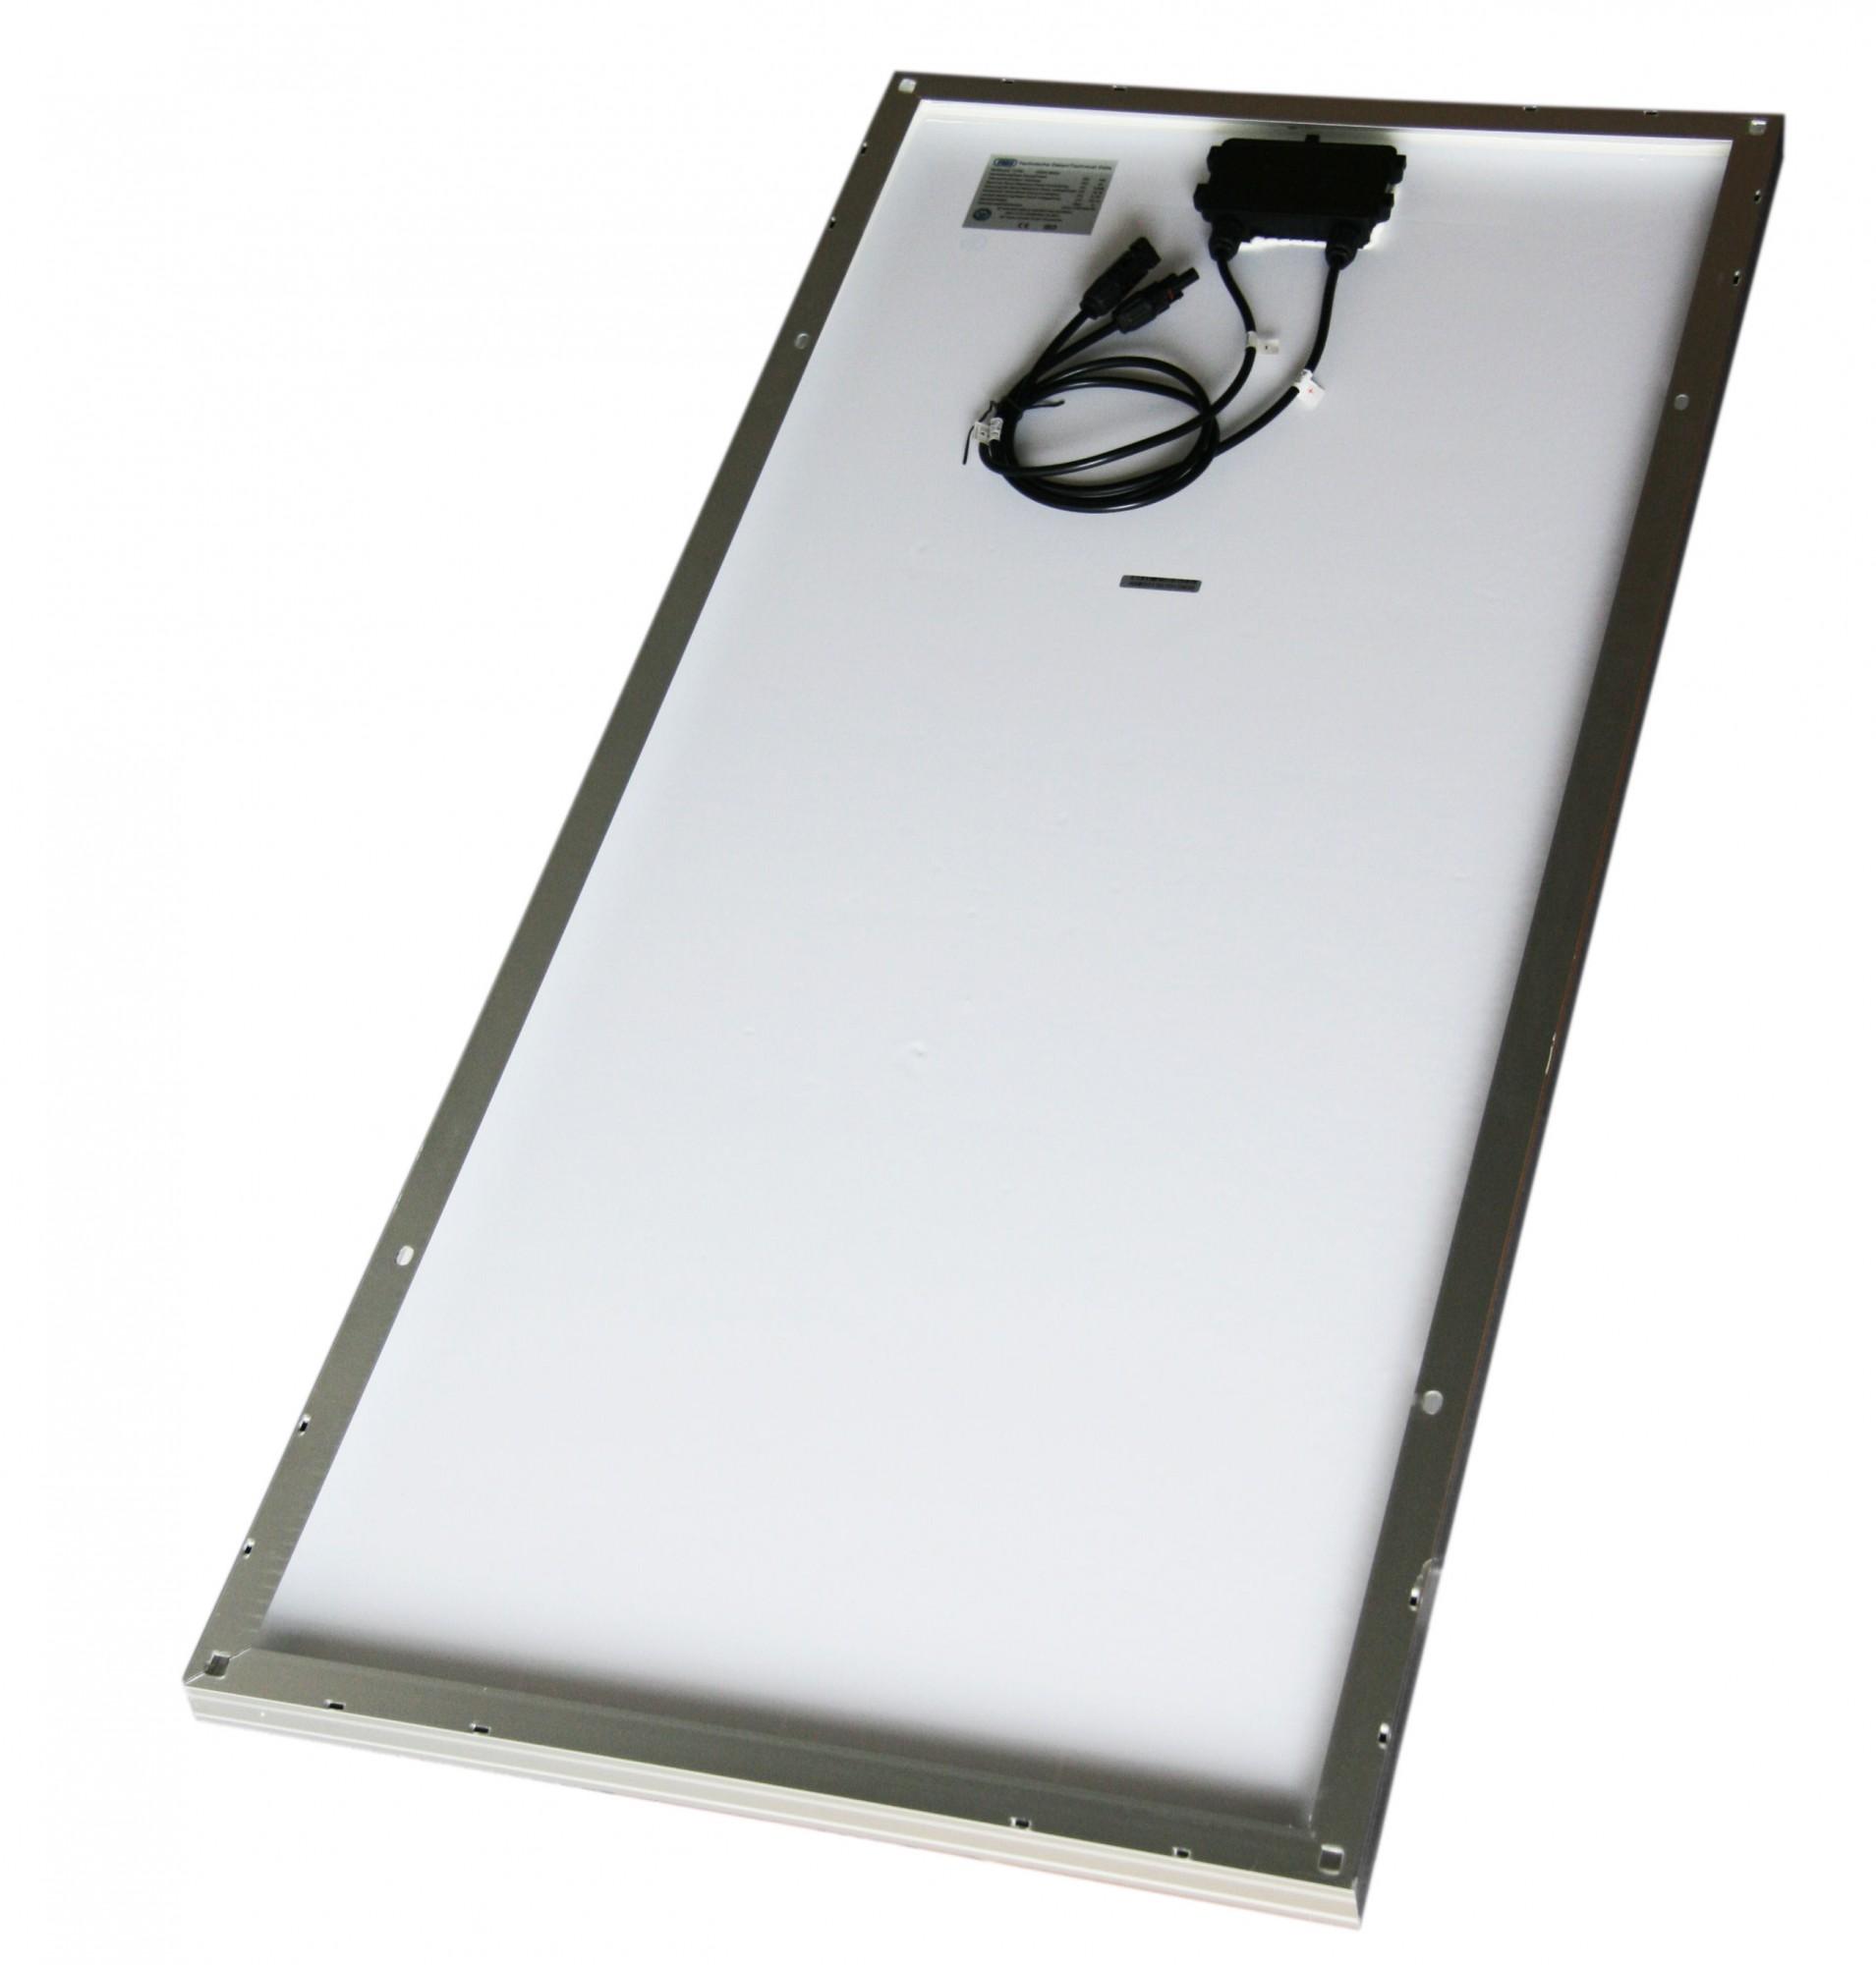 solarpanel solarmodul 12 v 150watt 150 w solarzelle 12 volt solar monokristallin. Black Bedroom Furniture Sets. Home Design Ideas